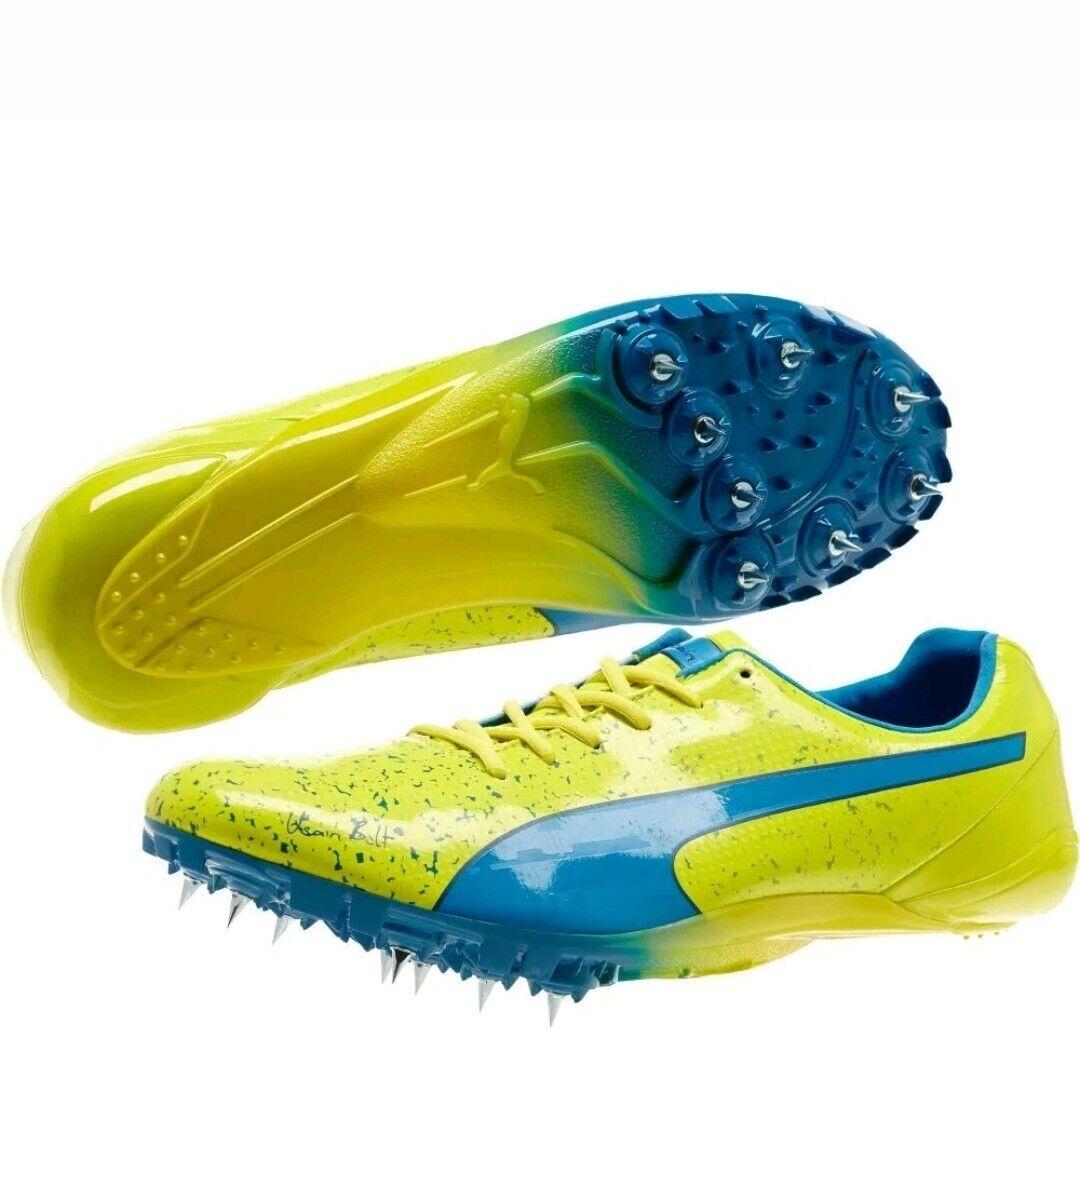 Esclusione come quello triangolo  PUMA evoSPEED Electric Spike Usain Bolt Sprint Running Track Shoes Spikes  for sale online   eBay